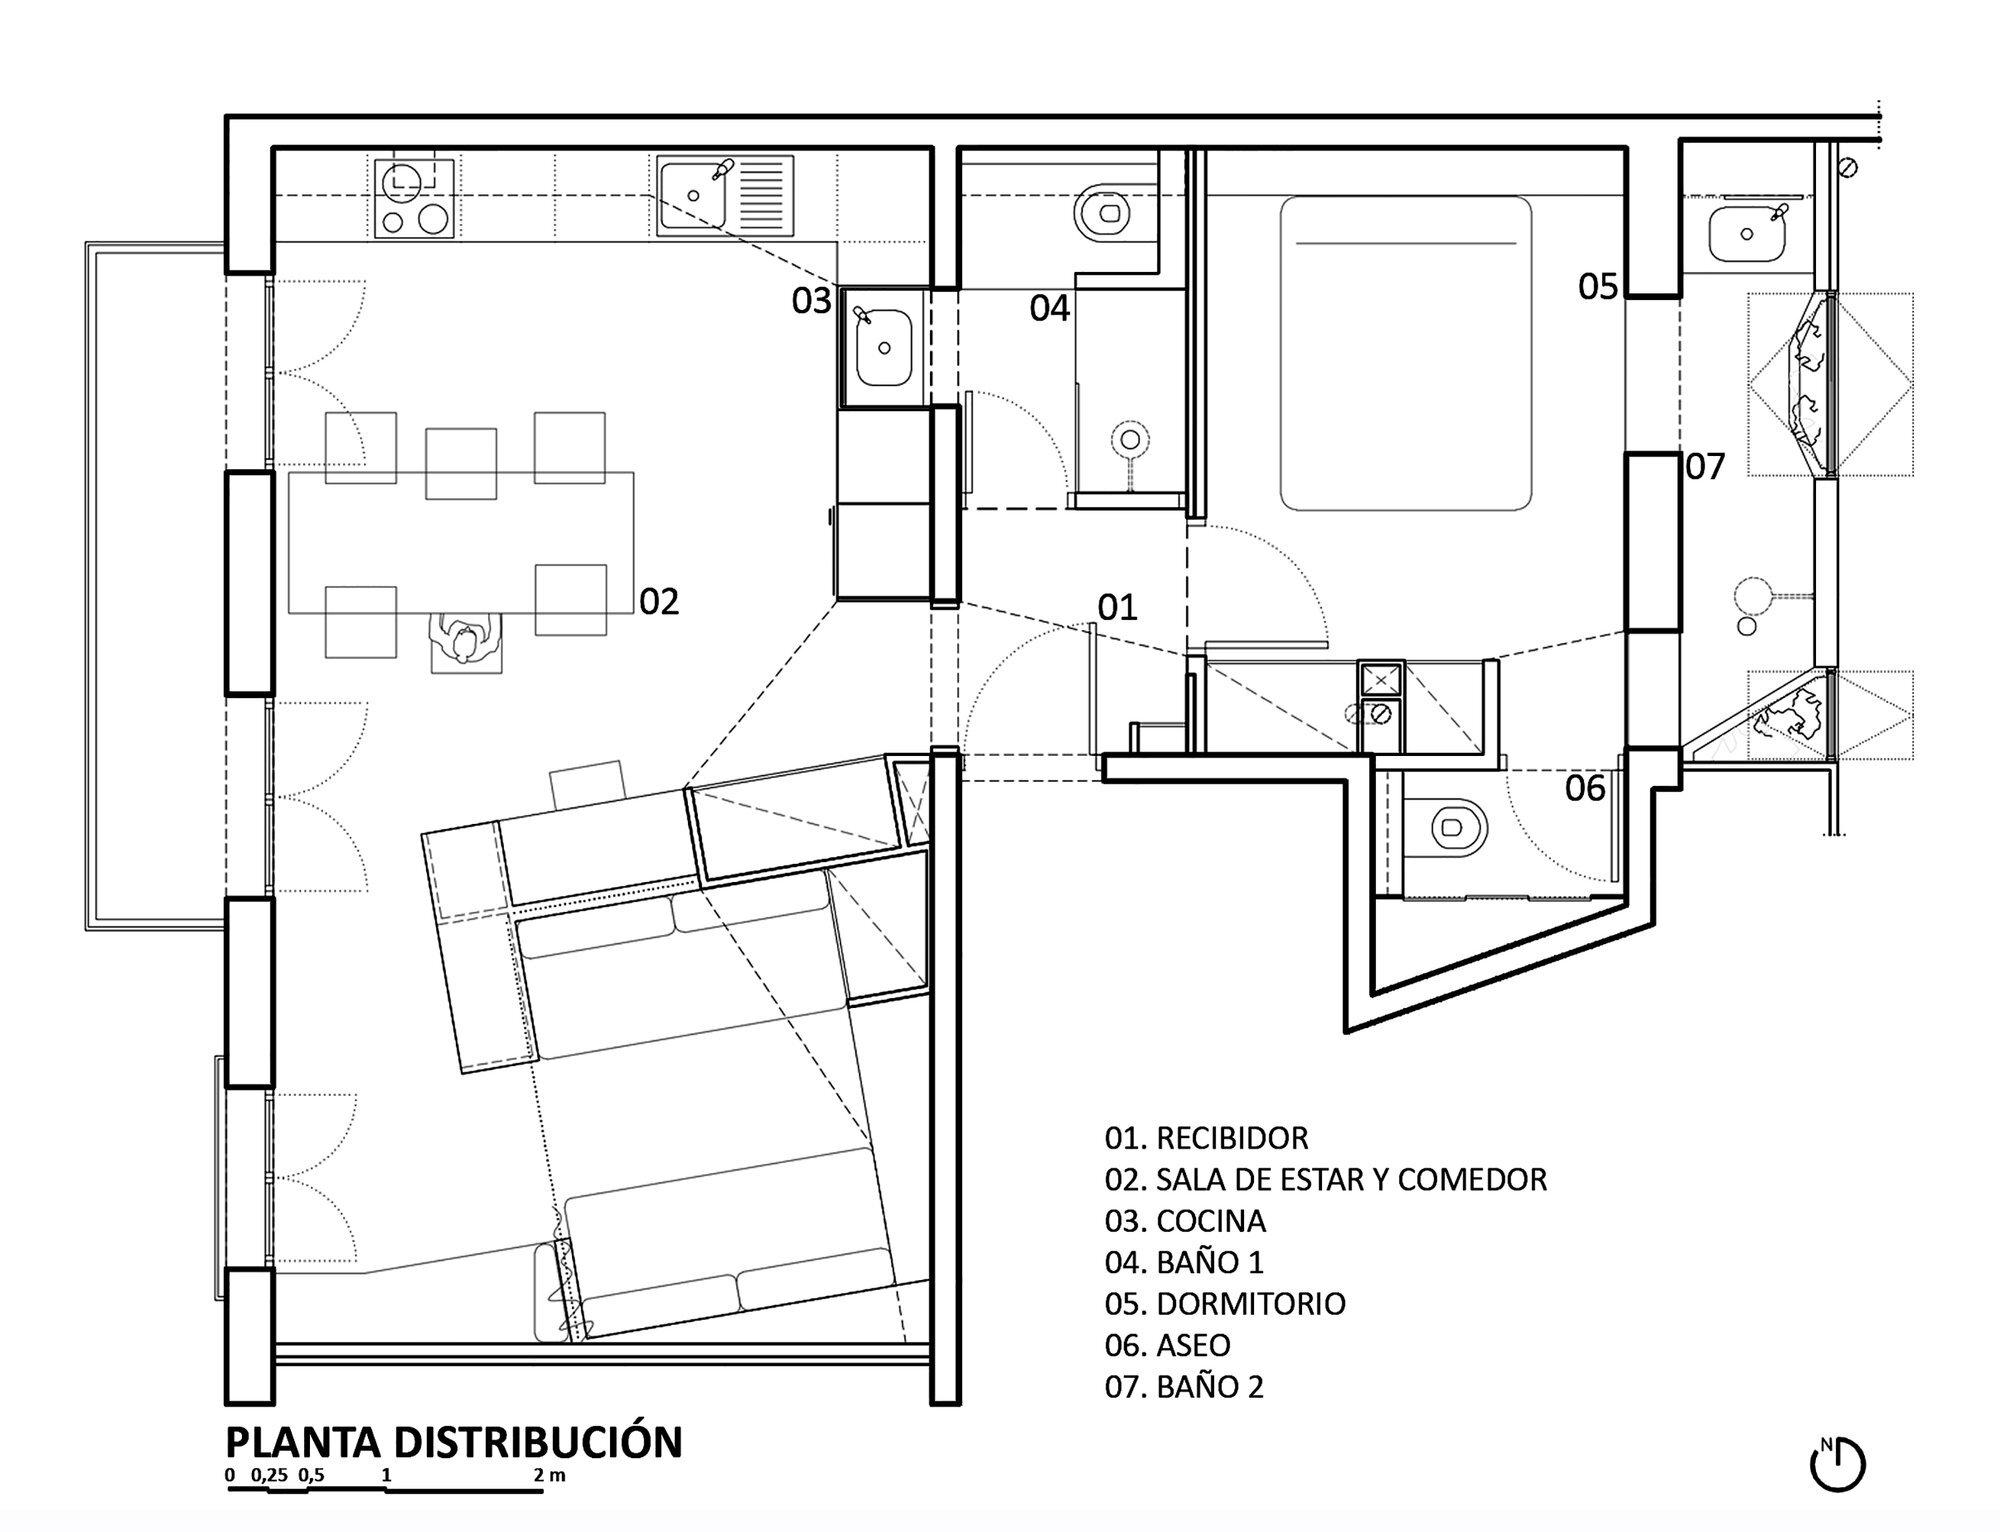 Apartment Pujades11 - Small Apartment - Miel Arquitectos + Studio P10 - Spain - Floor Plan - Humble Homes